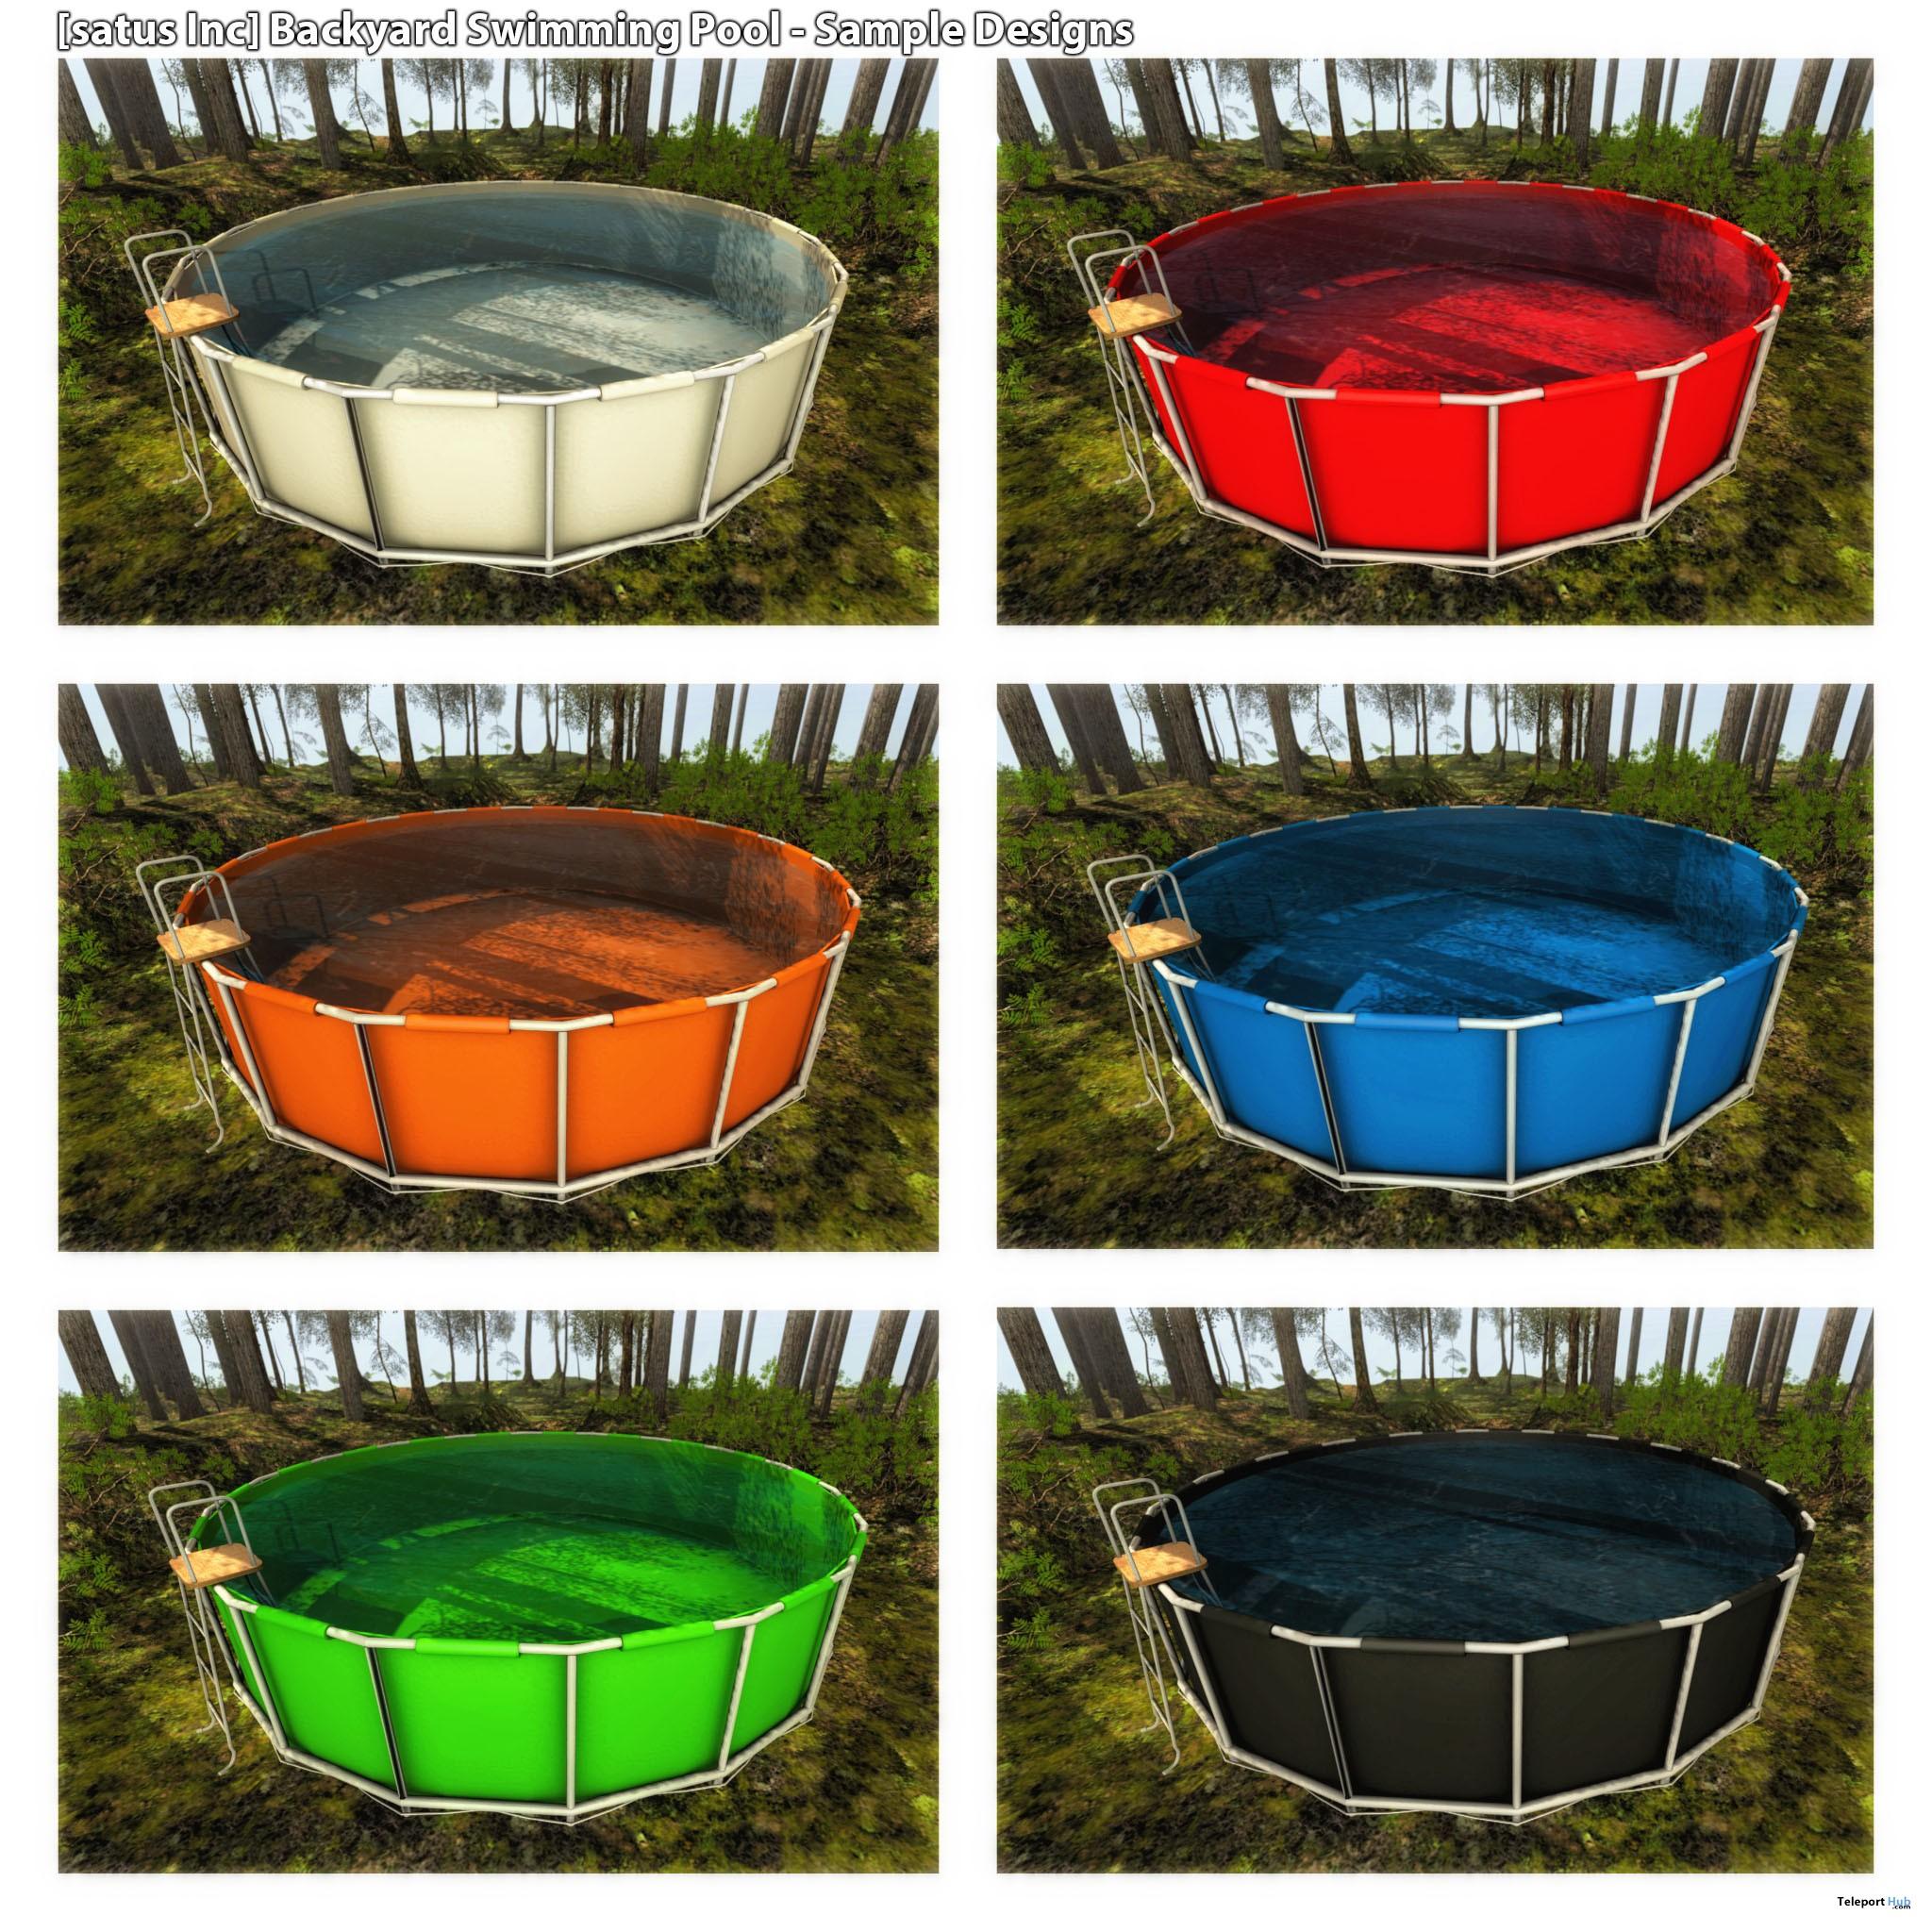 New Release: Backyard Swimming Pool by [satus Inc] - Teleport Hub - teleporthub.com